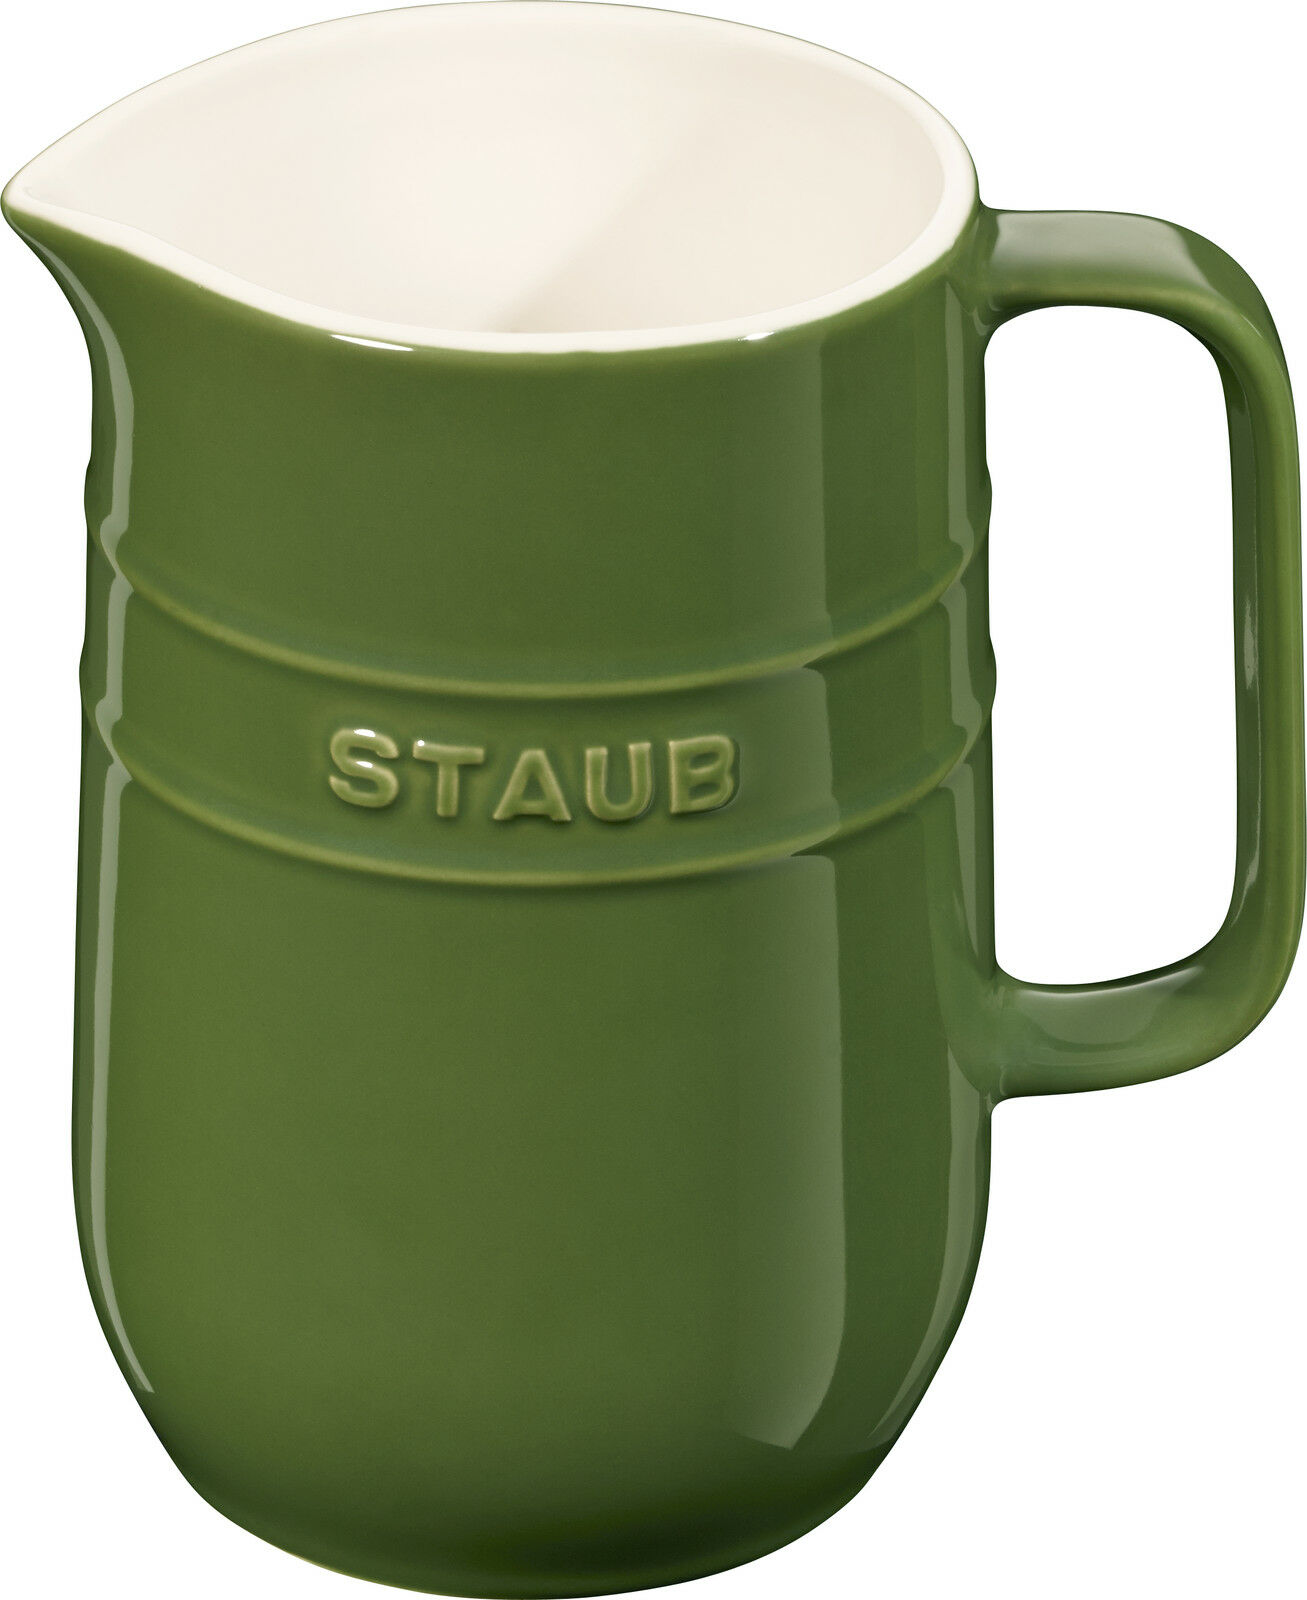 STAUB céramique cruche carafe Rond Basilic Vert 1L lave-vaisselle